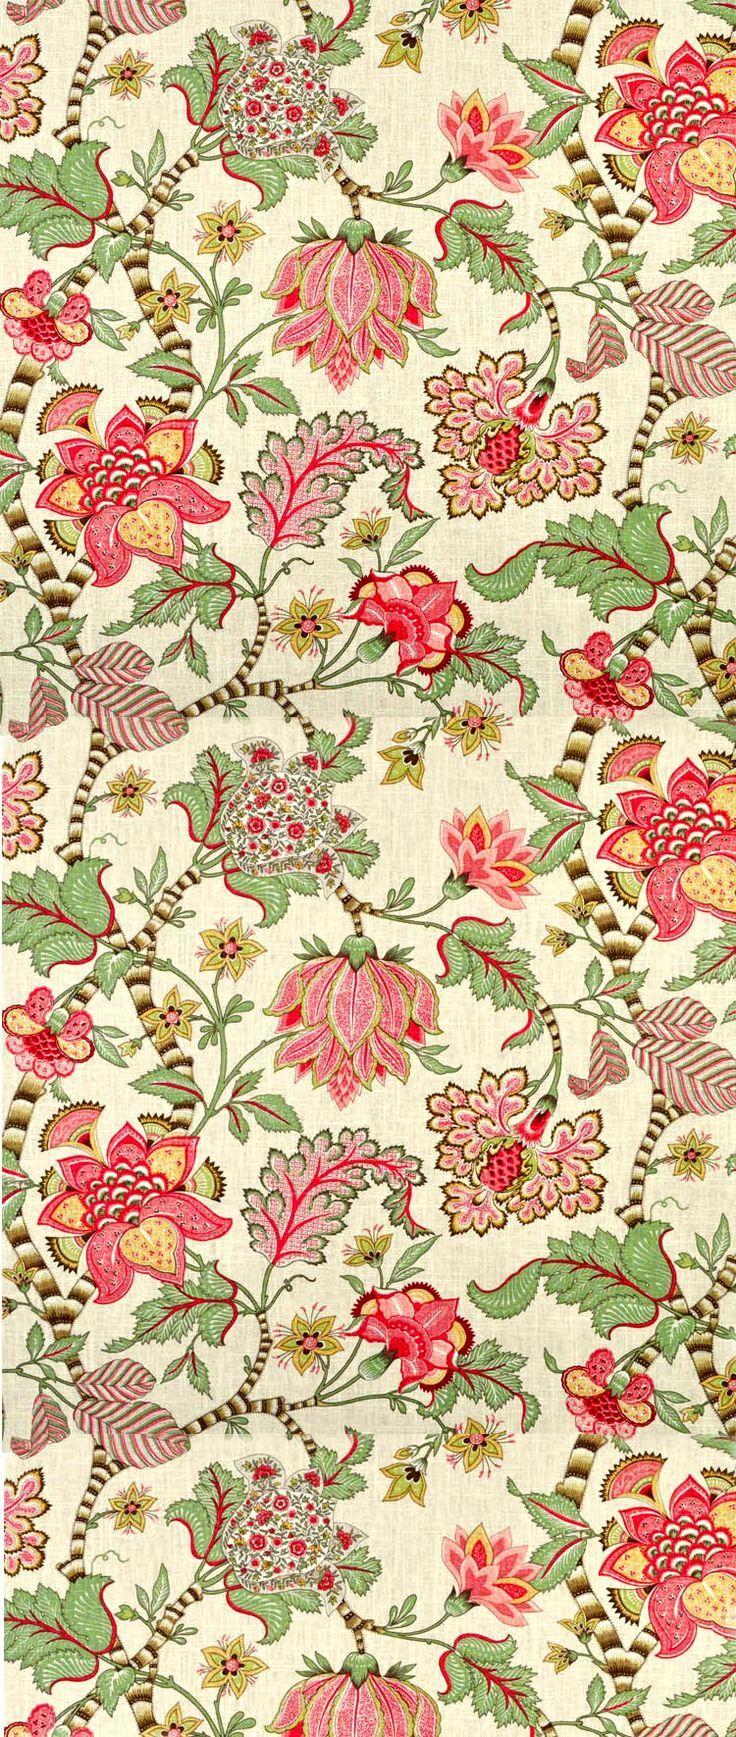 Manufacture Francaise Des Textiles D Ameublement 213 best chintz images | chintz fabric, printing on fabric